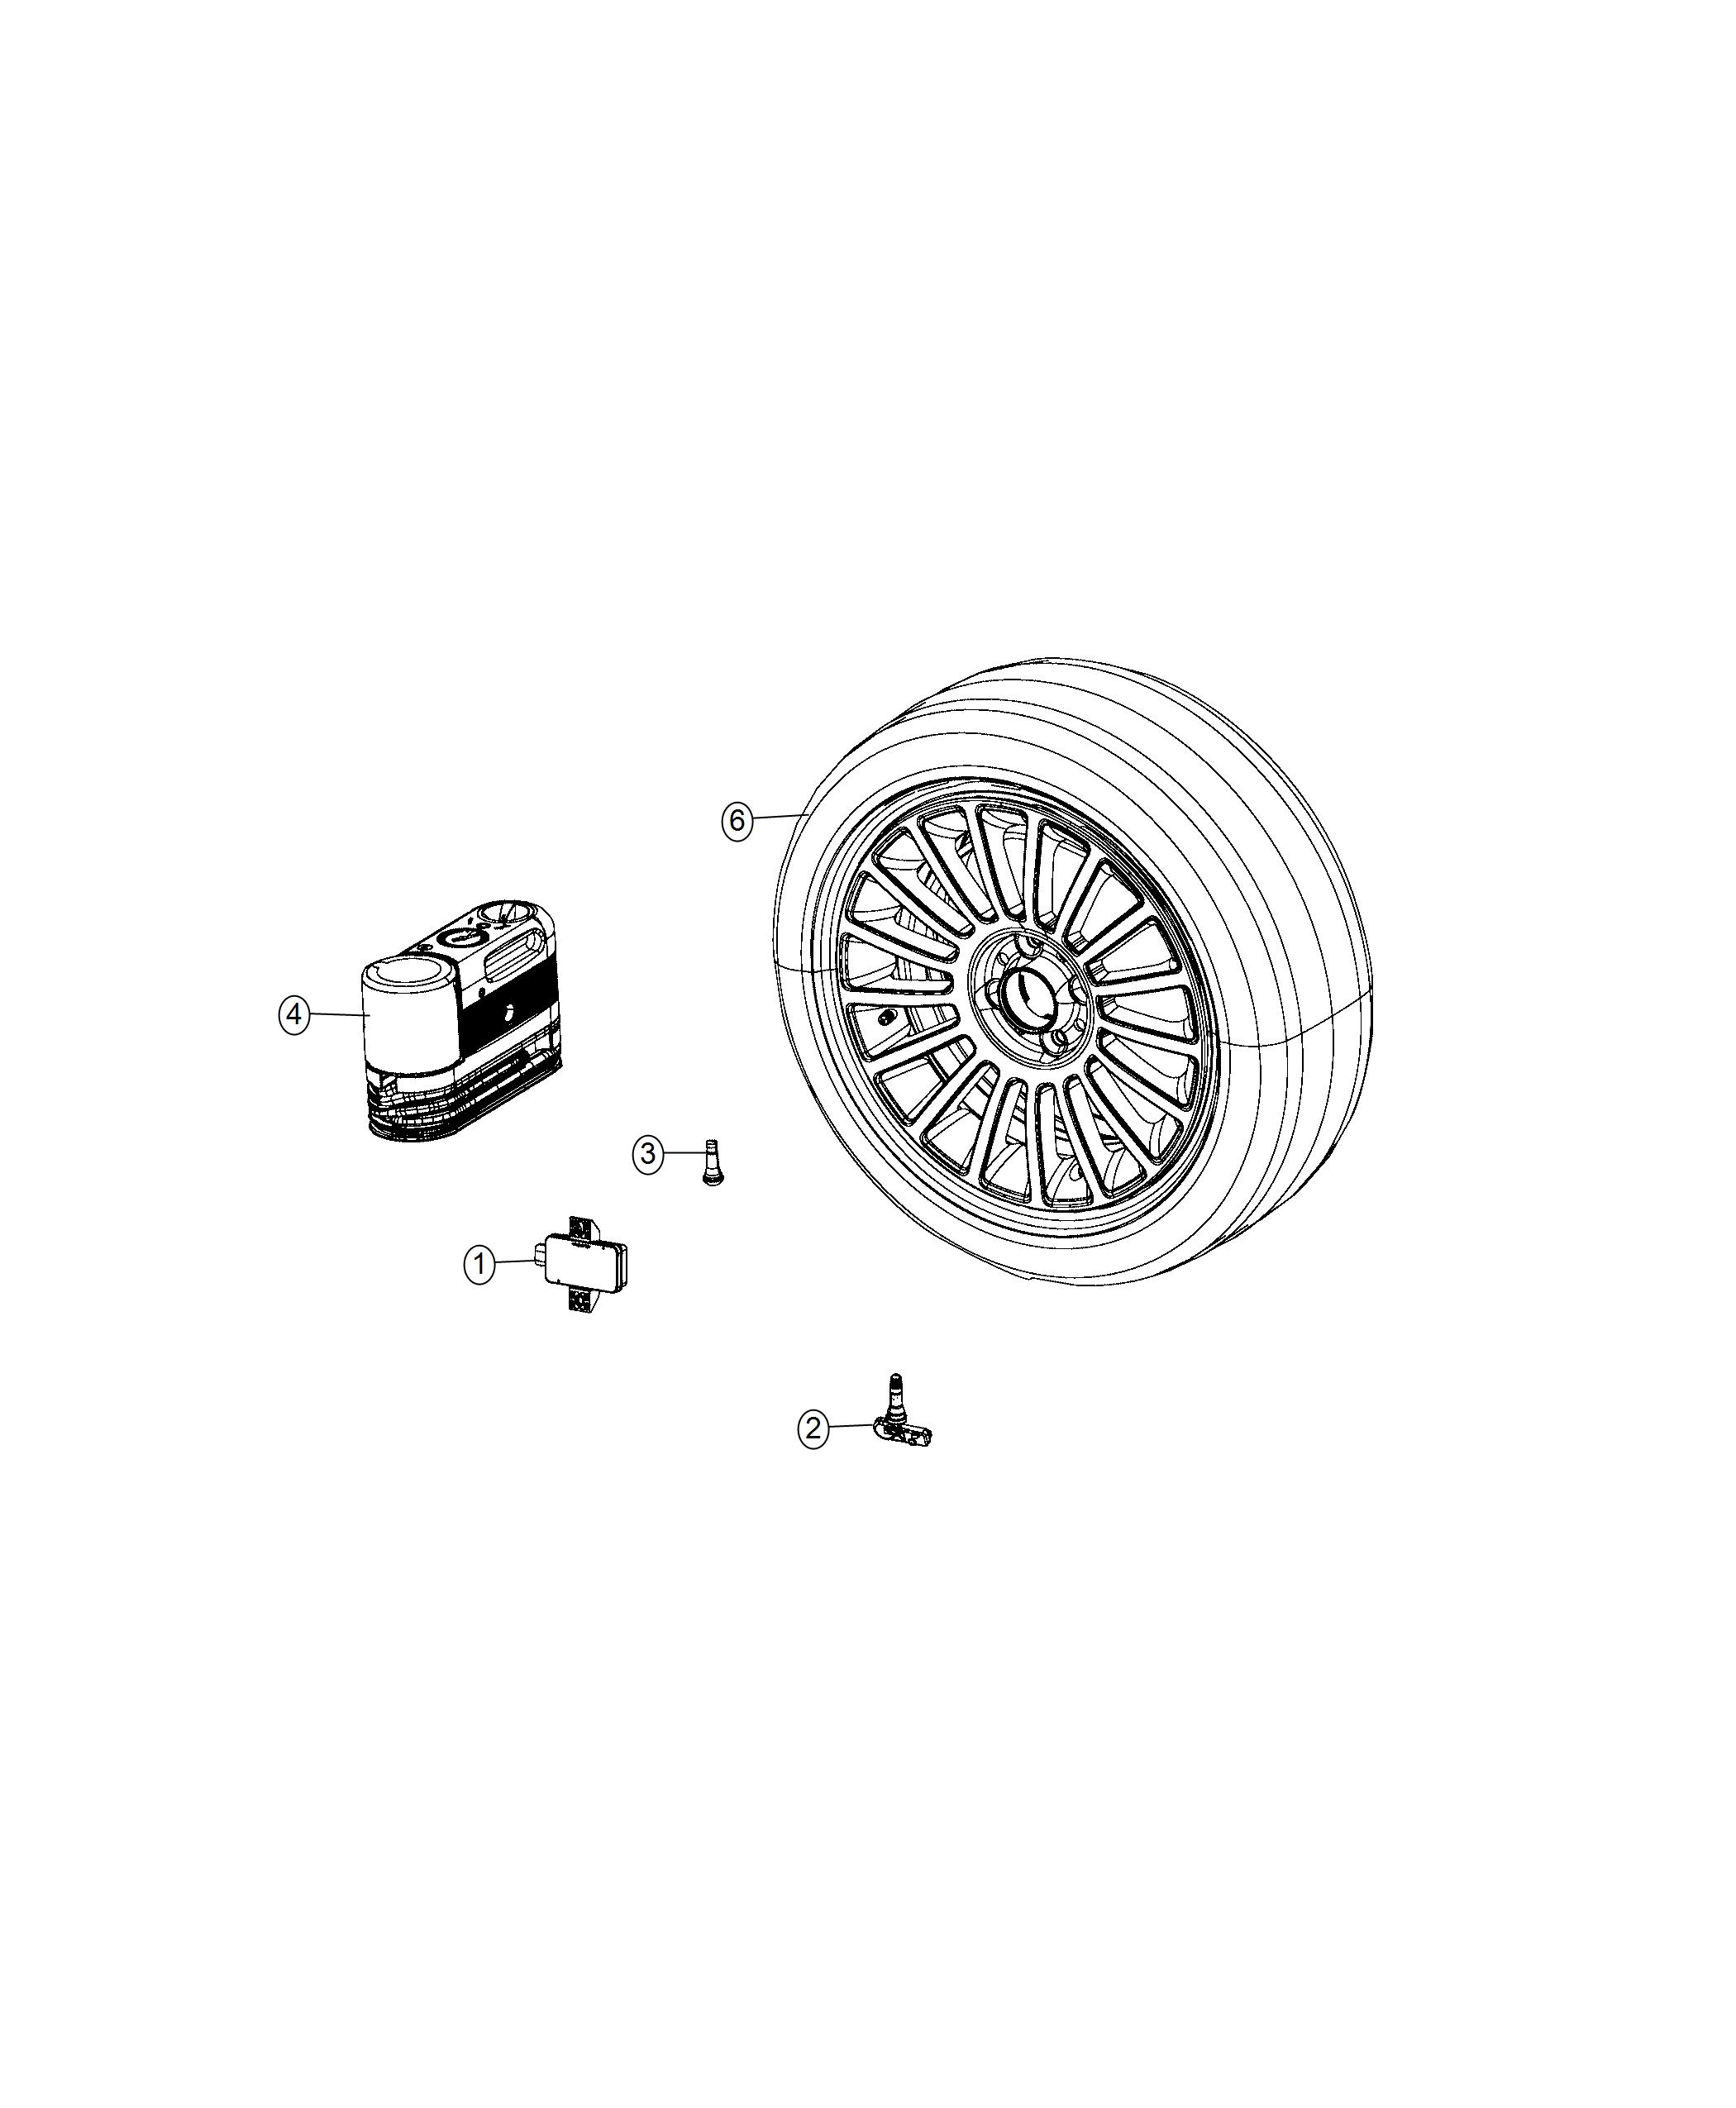 Fiat 500c Module Tire Pressure Monitoring Tire